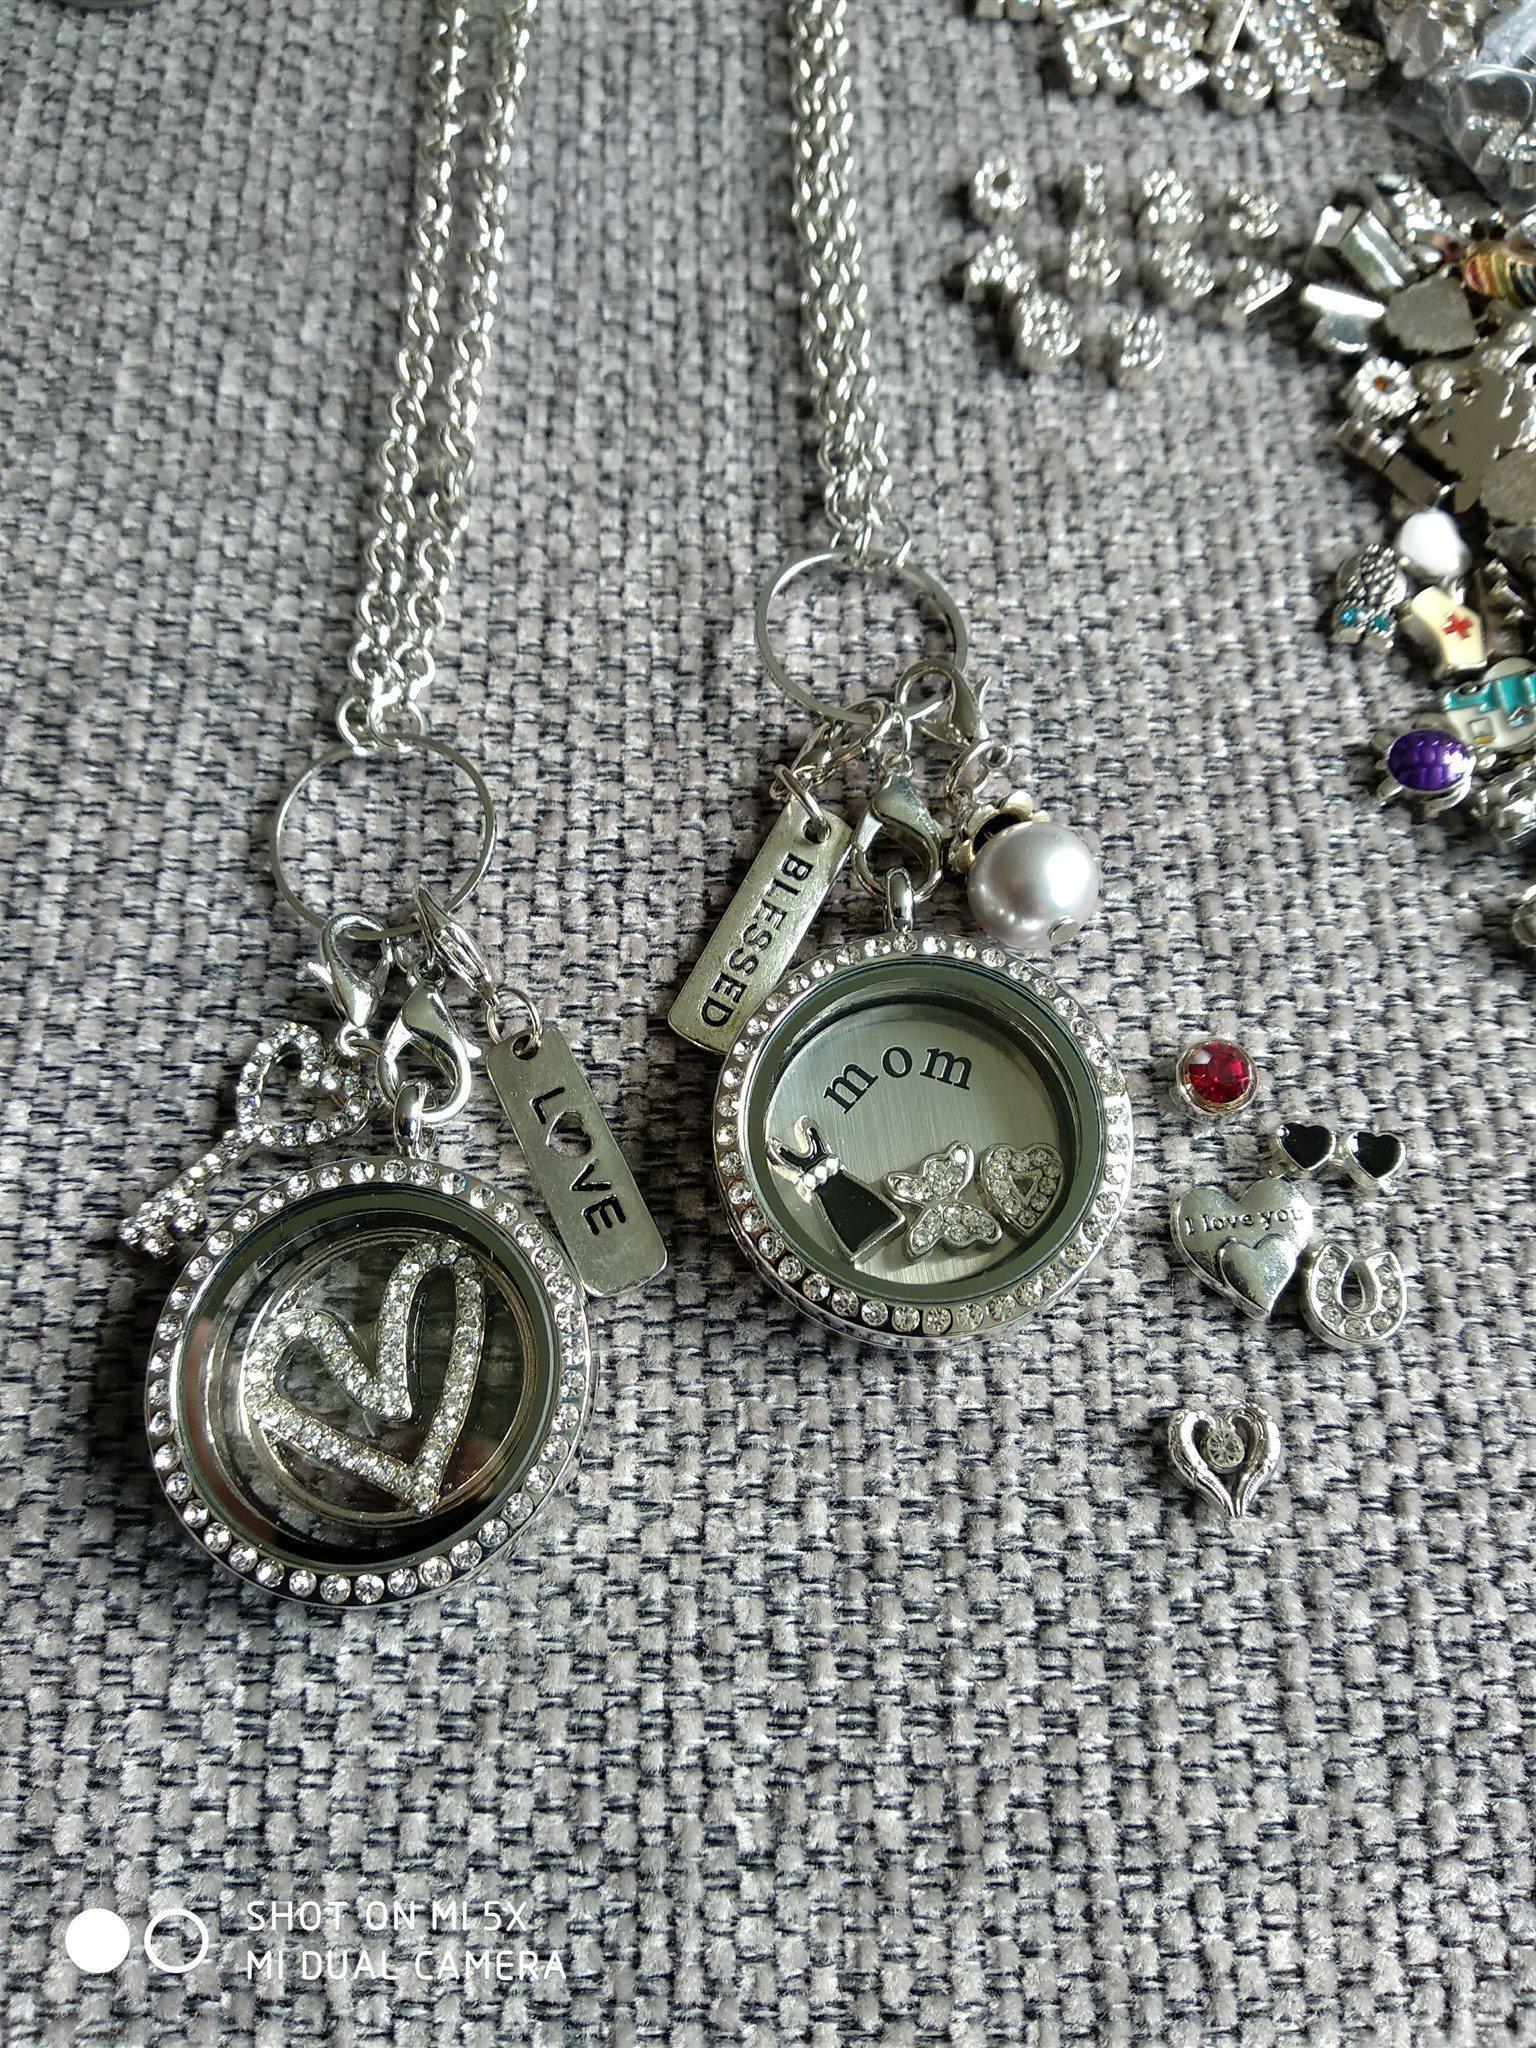 Paket 22 15 st halsband med flytande berlocker.. (332123505) ᐈ Köp ... 69cfd41950798